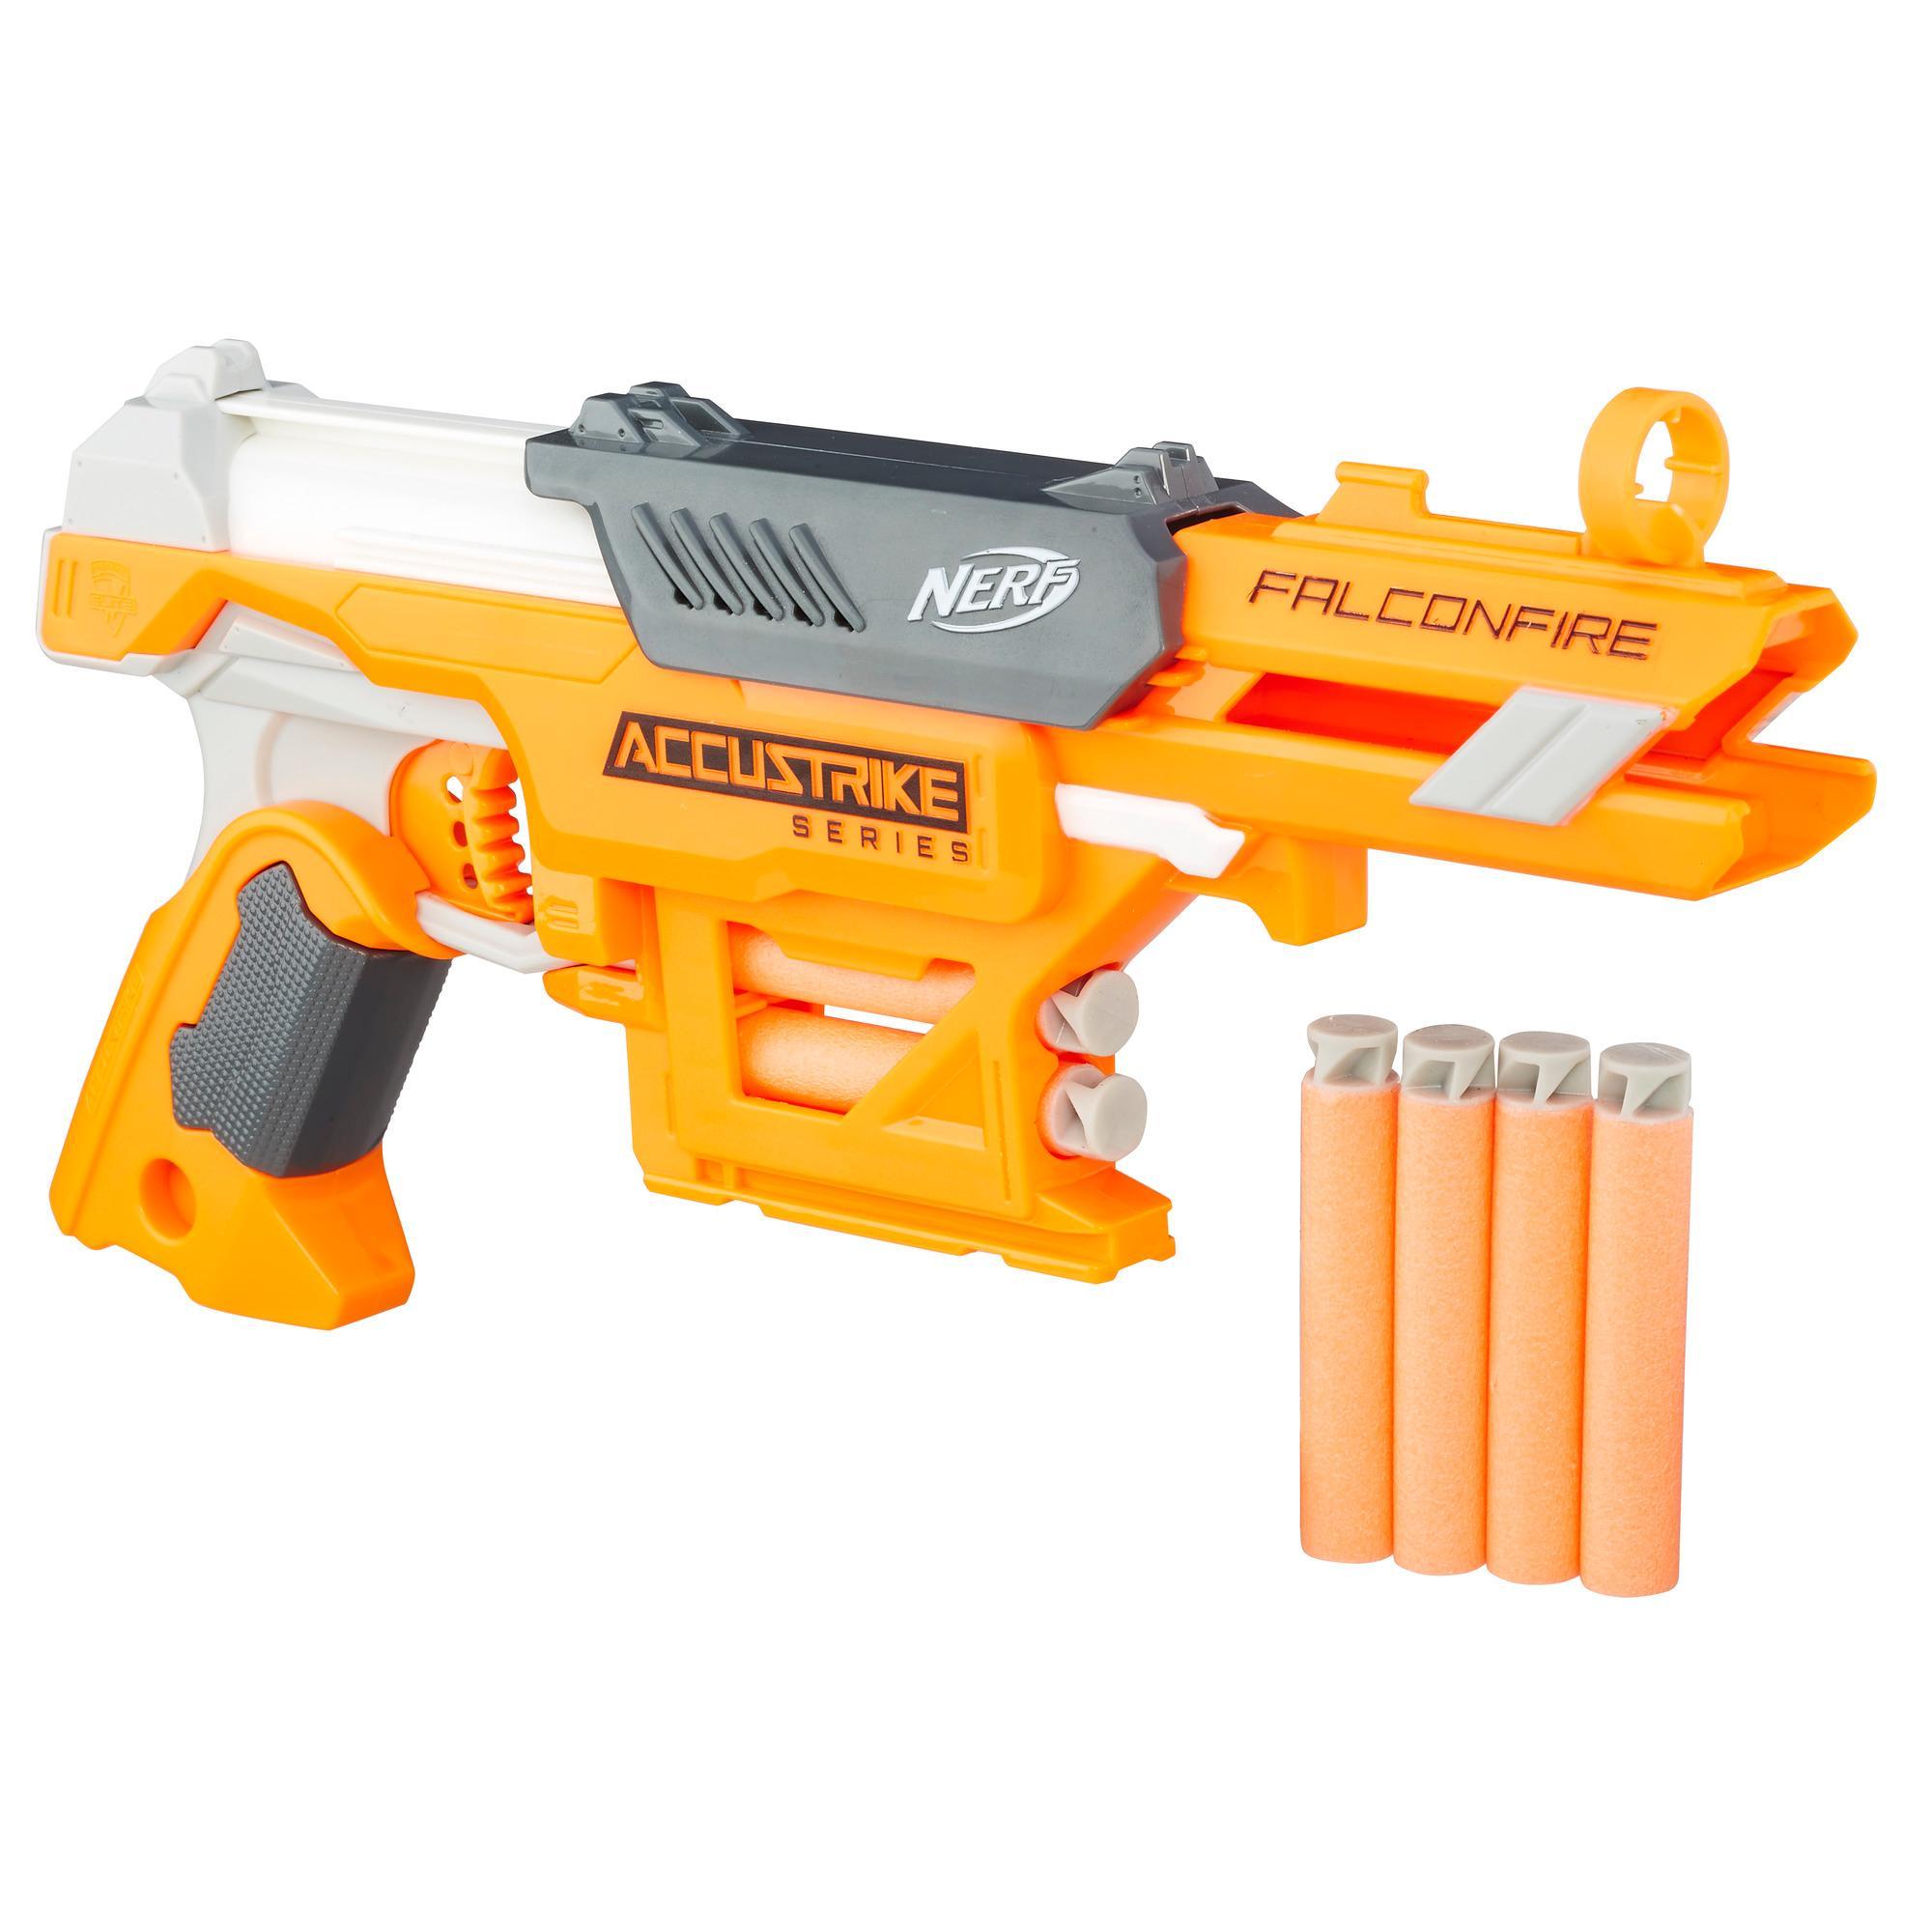 Blaster NERF AccuStrike Falconfire